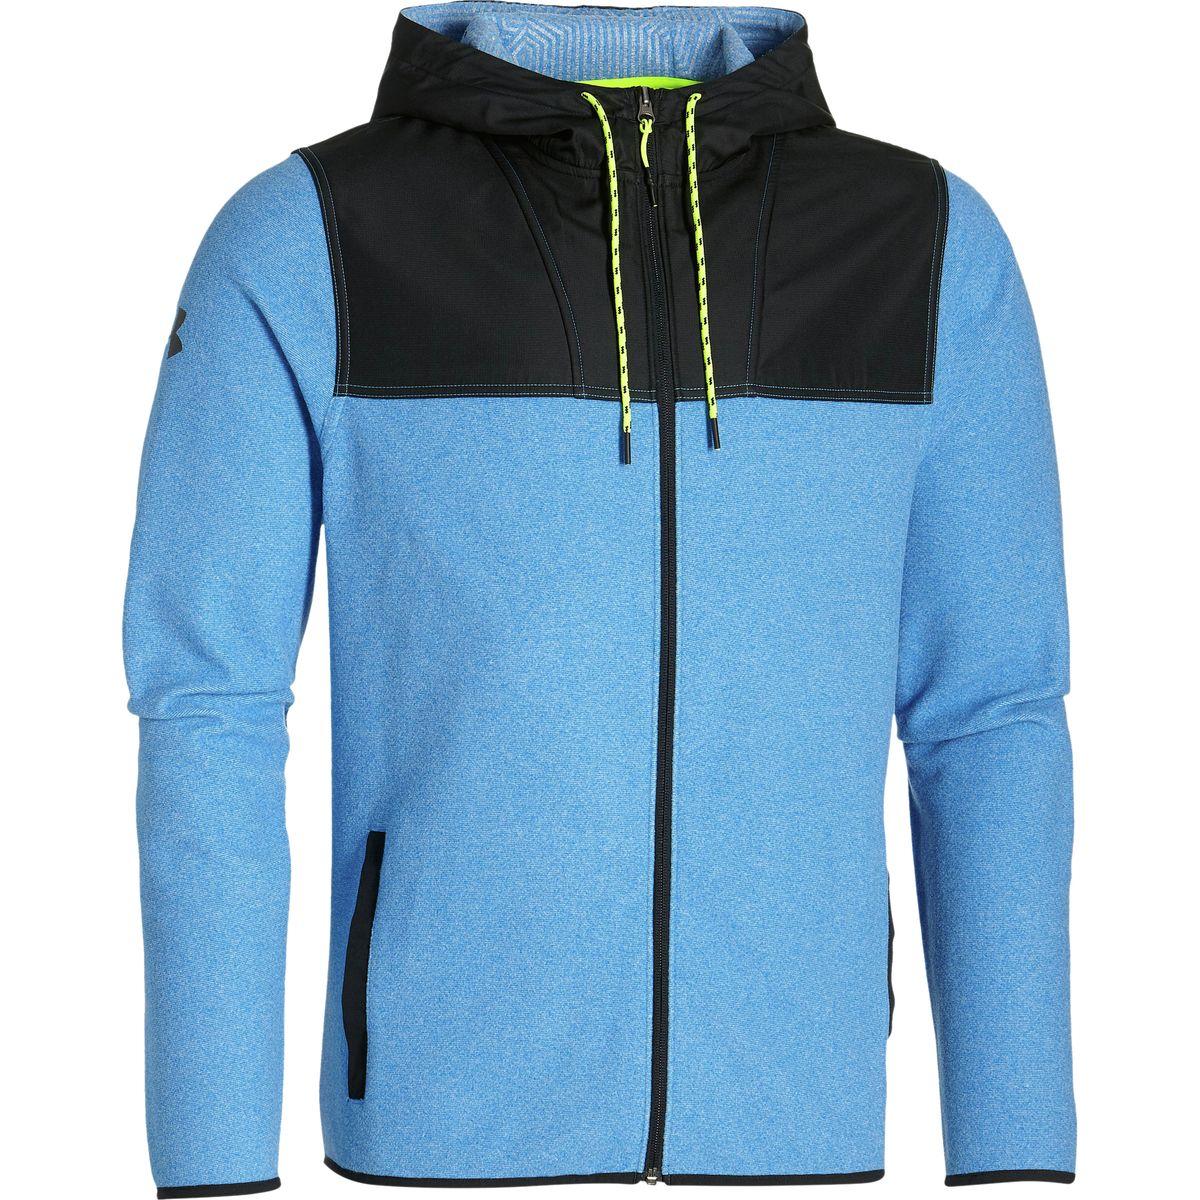 Under Armour ColdGear Infrared Survival Hooded Fleece Jacket - Men